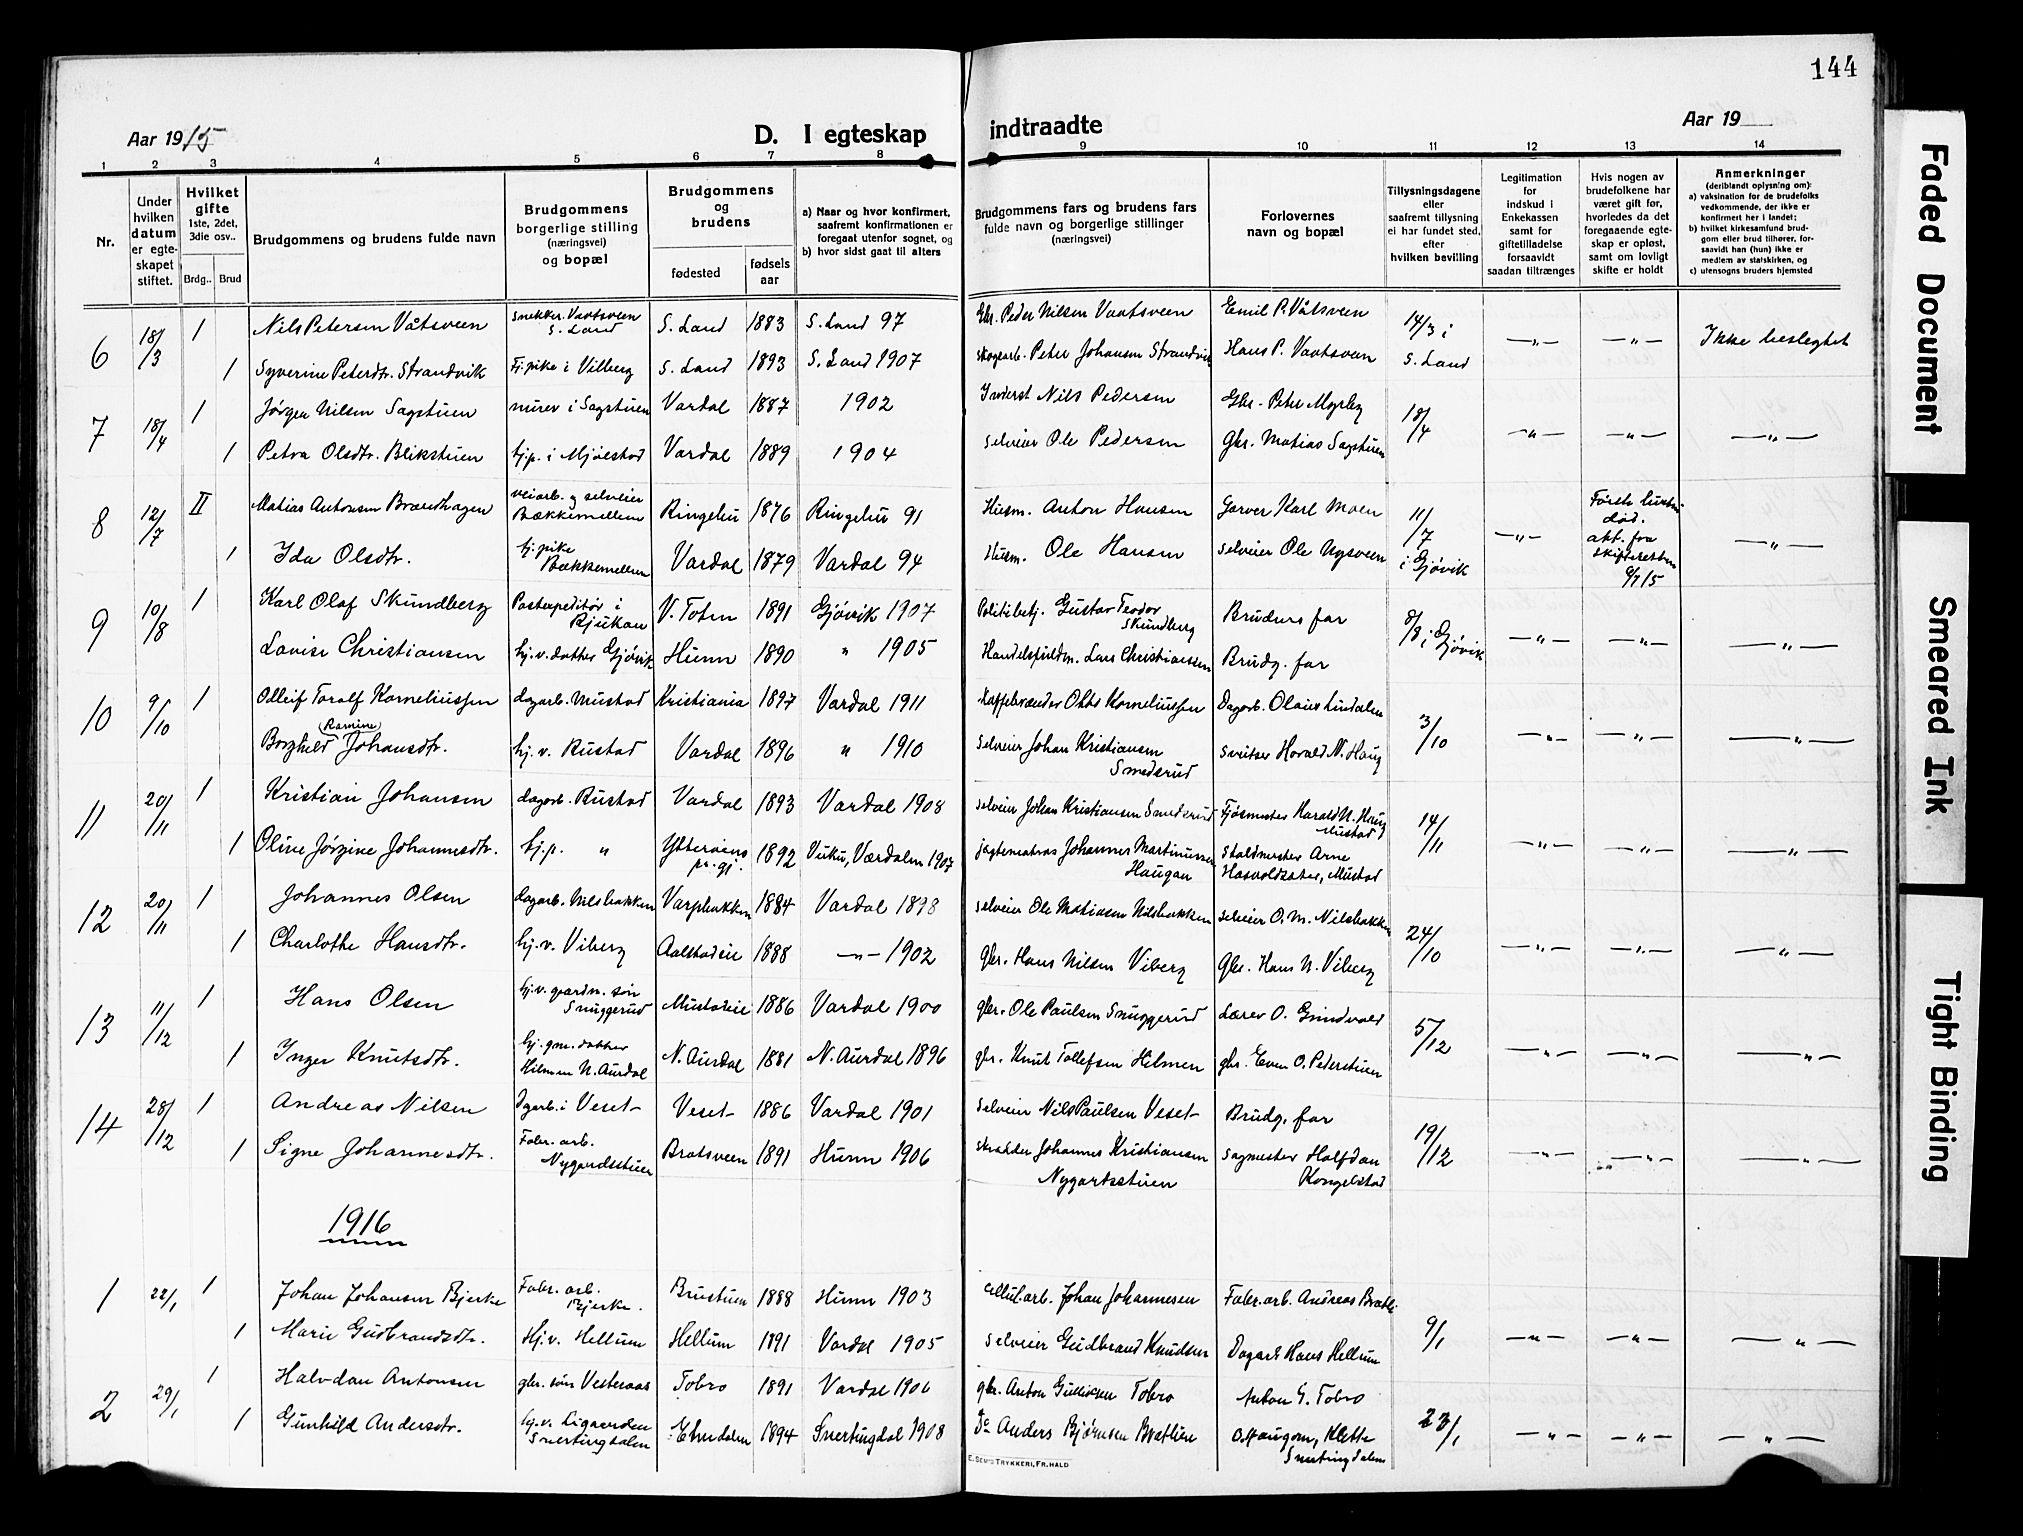 SAH, Vardal prestekontor, H/Ha/Hab/L0015: Klokkerbok nr. 15, 1914-1931, s. 144